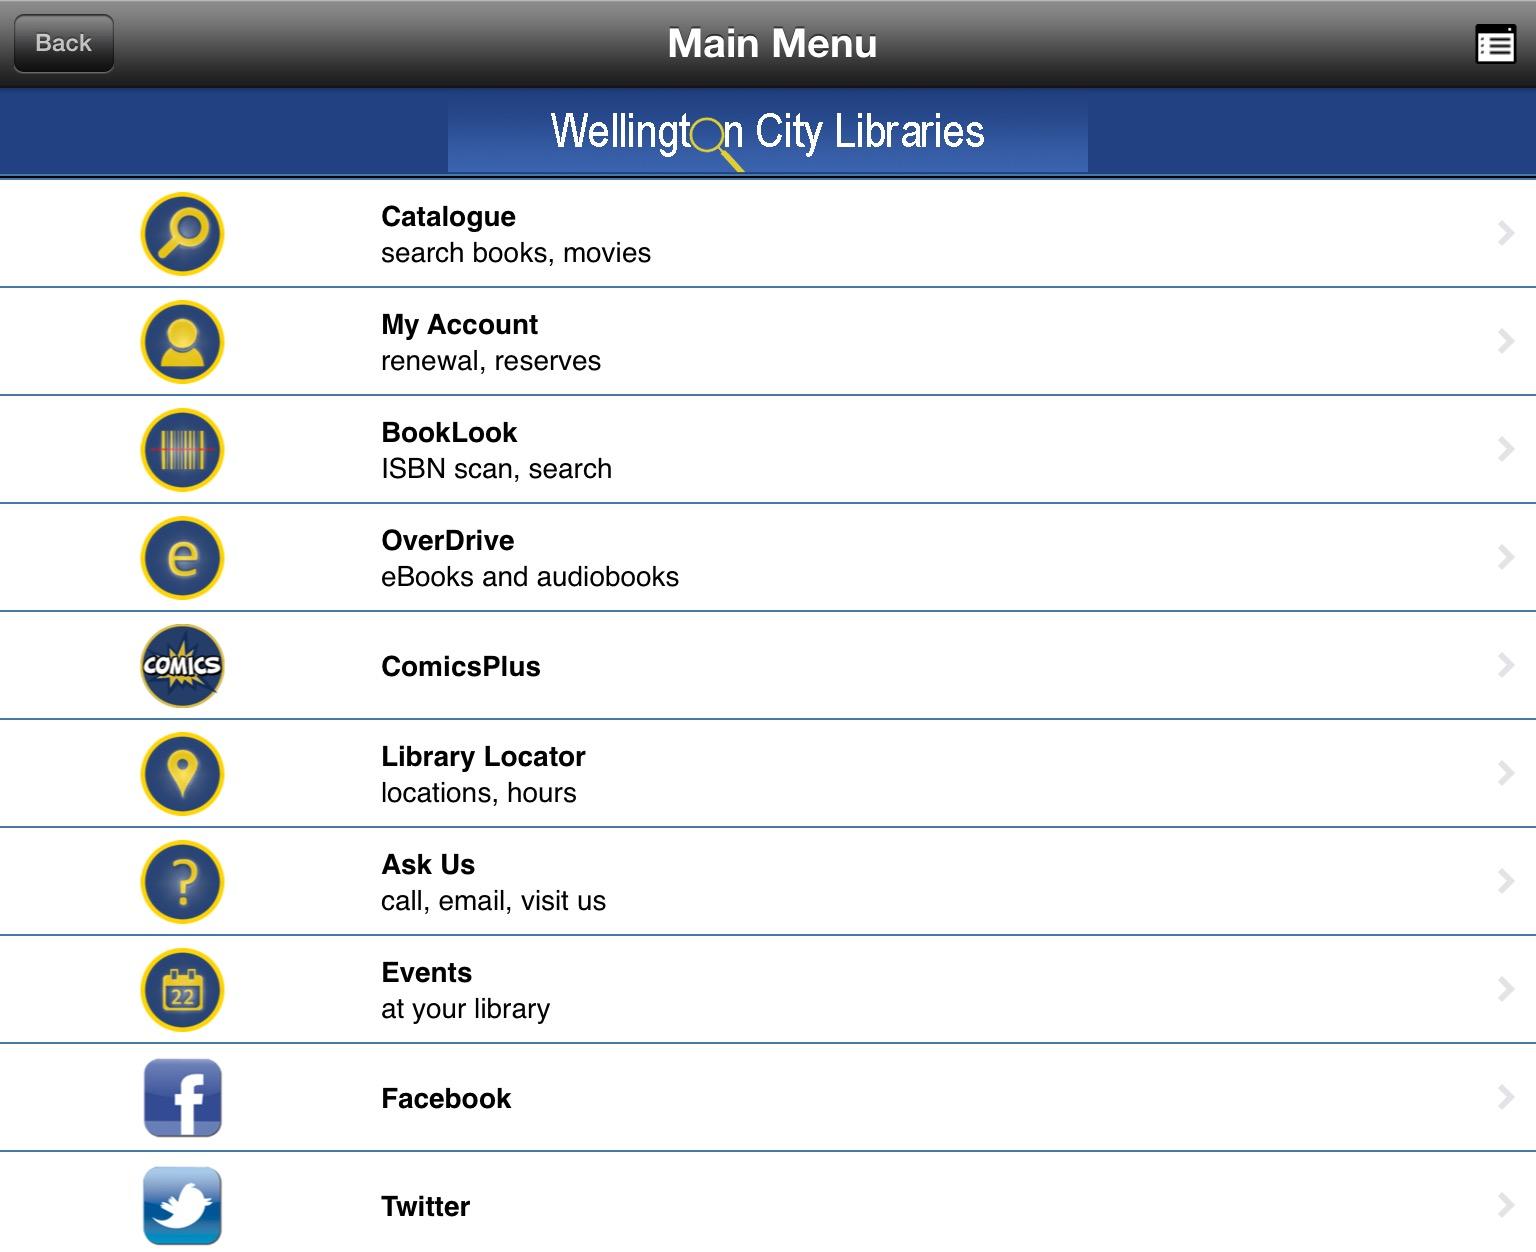 WCL app screenshot